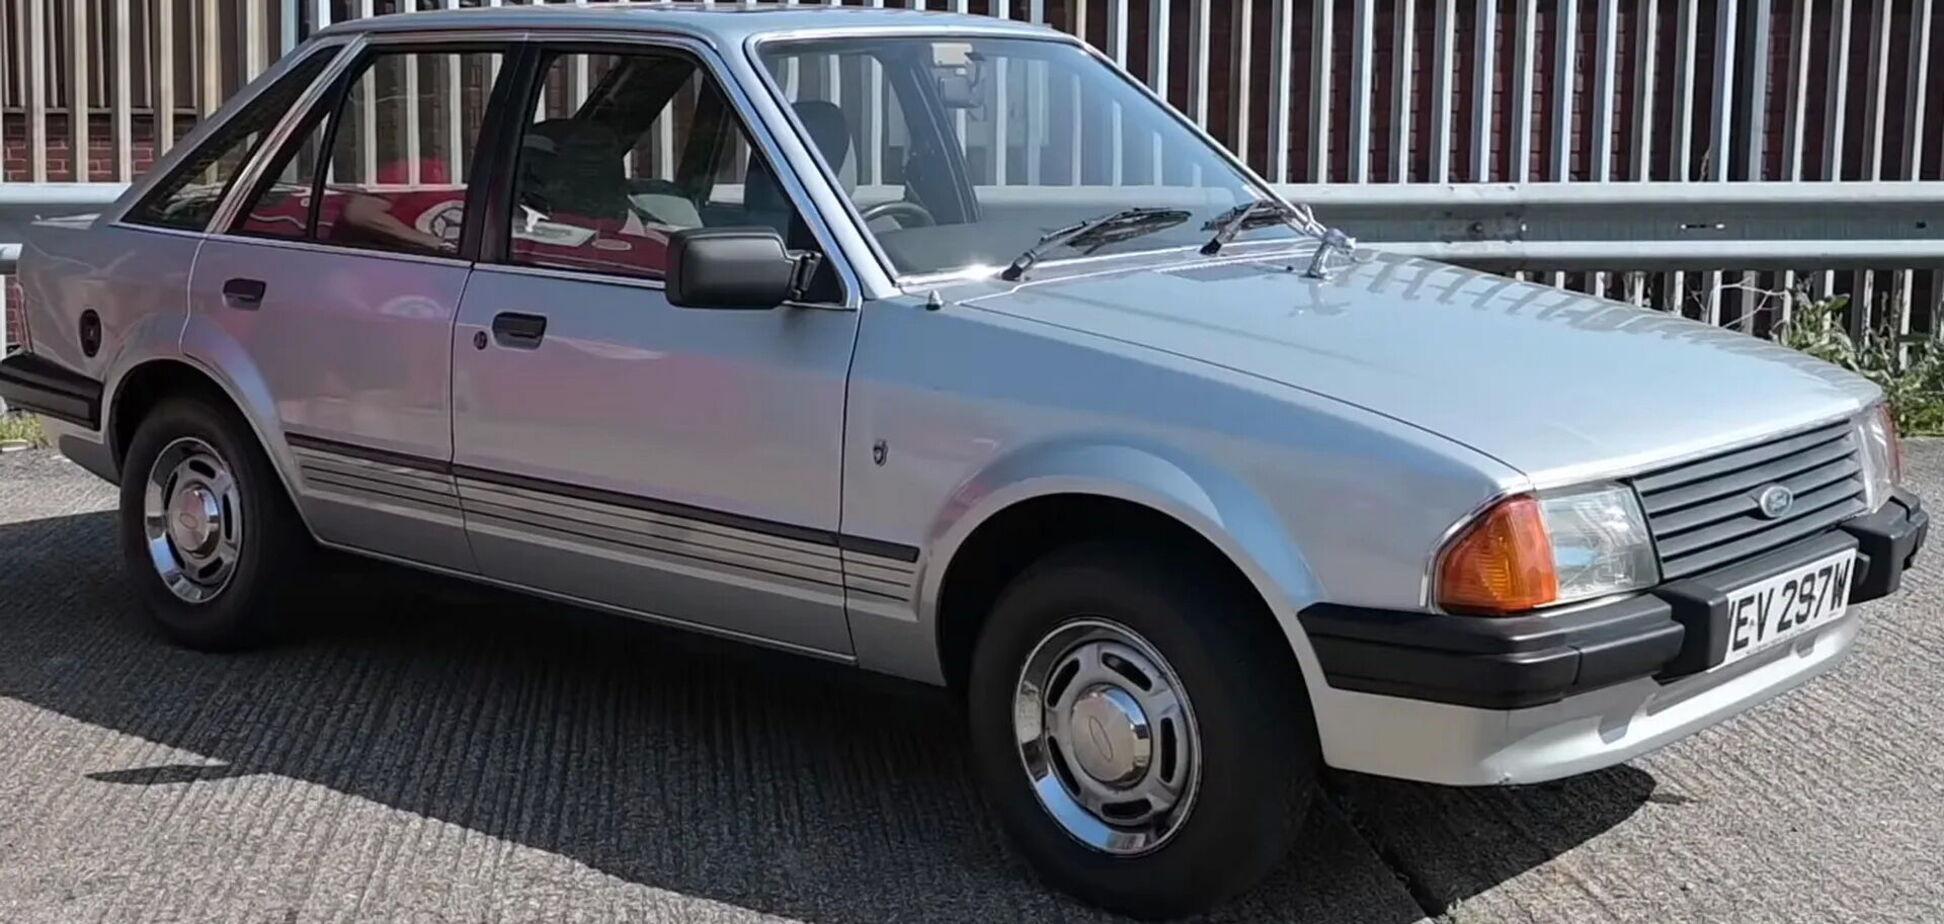 Ford Escort Ghia принцеси Діани продали за $65000. Відео